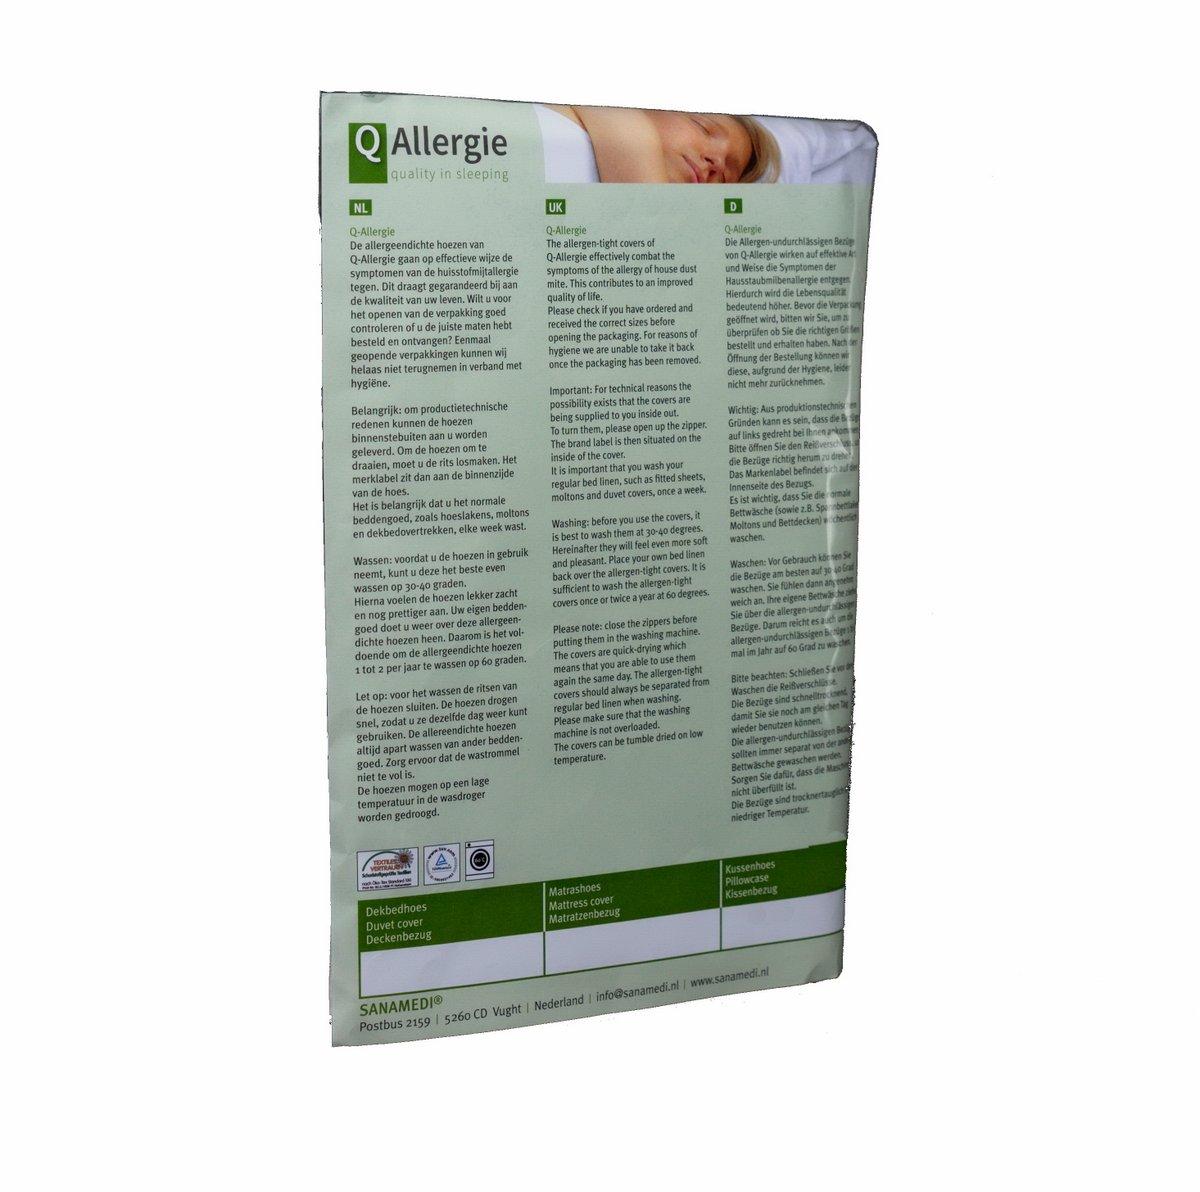 Kussenhoes Q-Allergie